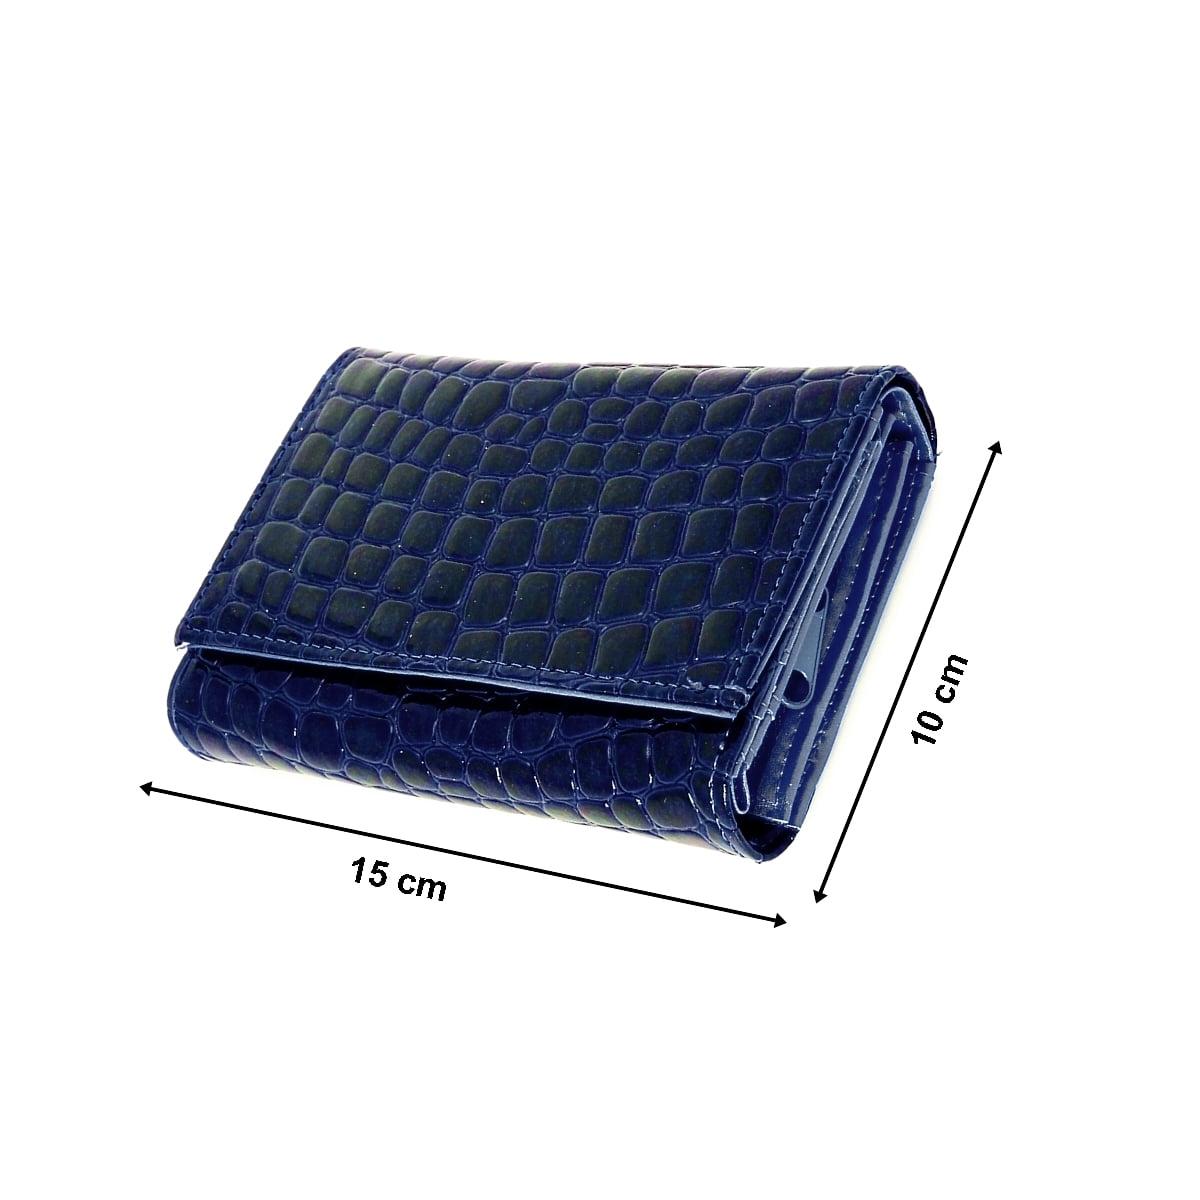 Portofel dama, lacuit, blumarin, buzunar mare lateral,,din material sintetic,15/10 cm, Magrot 4016